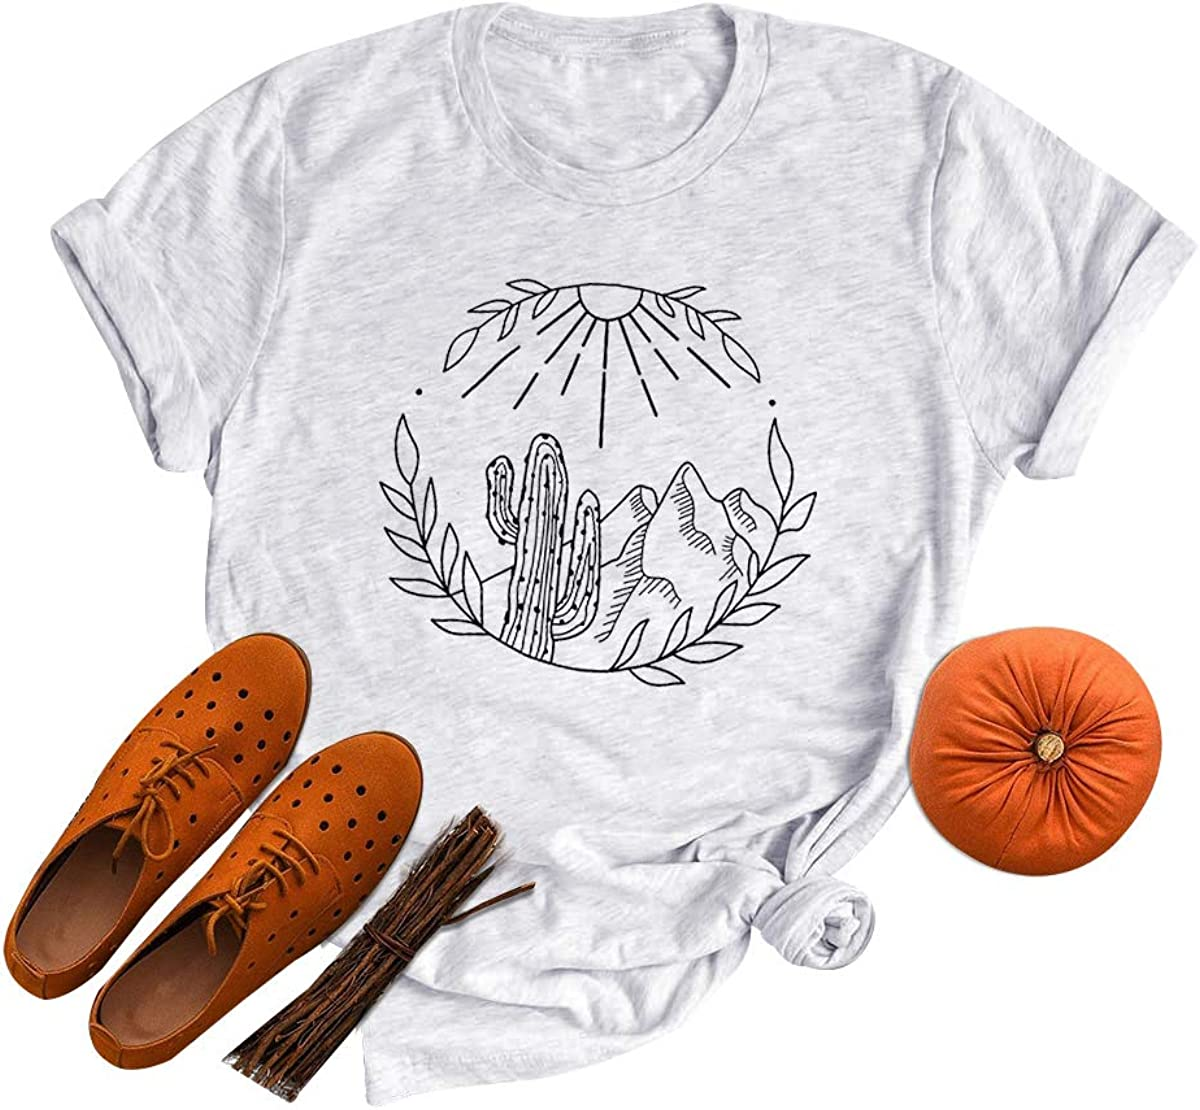 GEMLON Cactus T Shirt Women Nashville-Davidson Mall Graphic Super beauty product restock quality top! Travel Retro Western